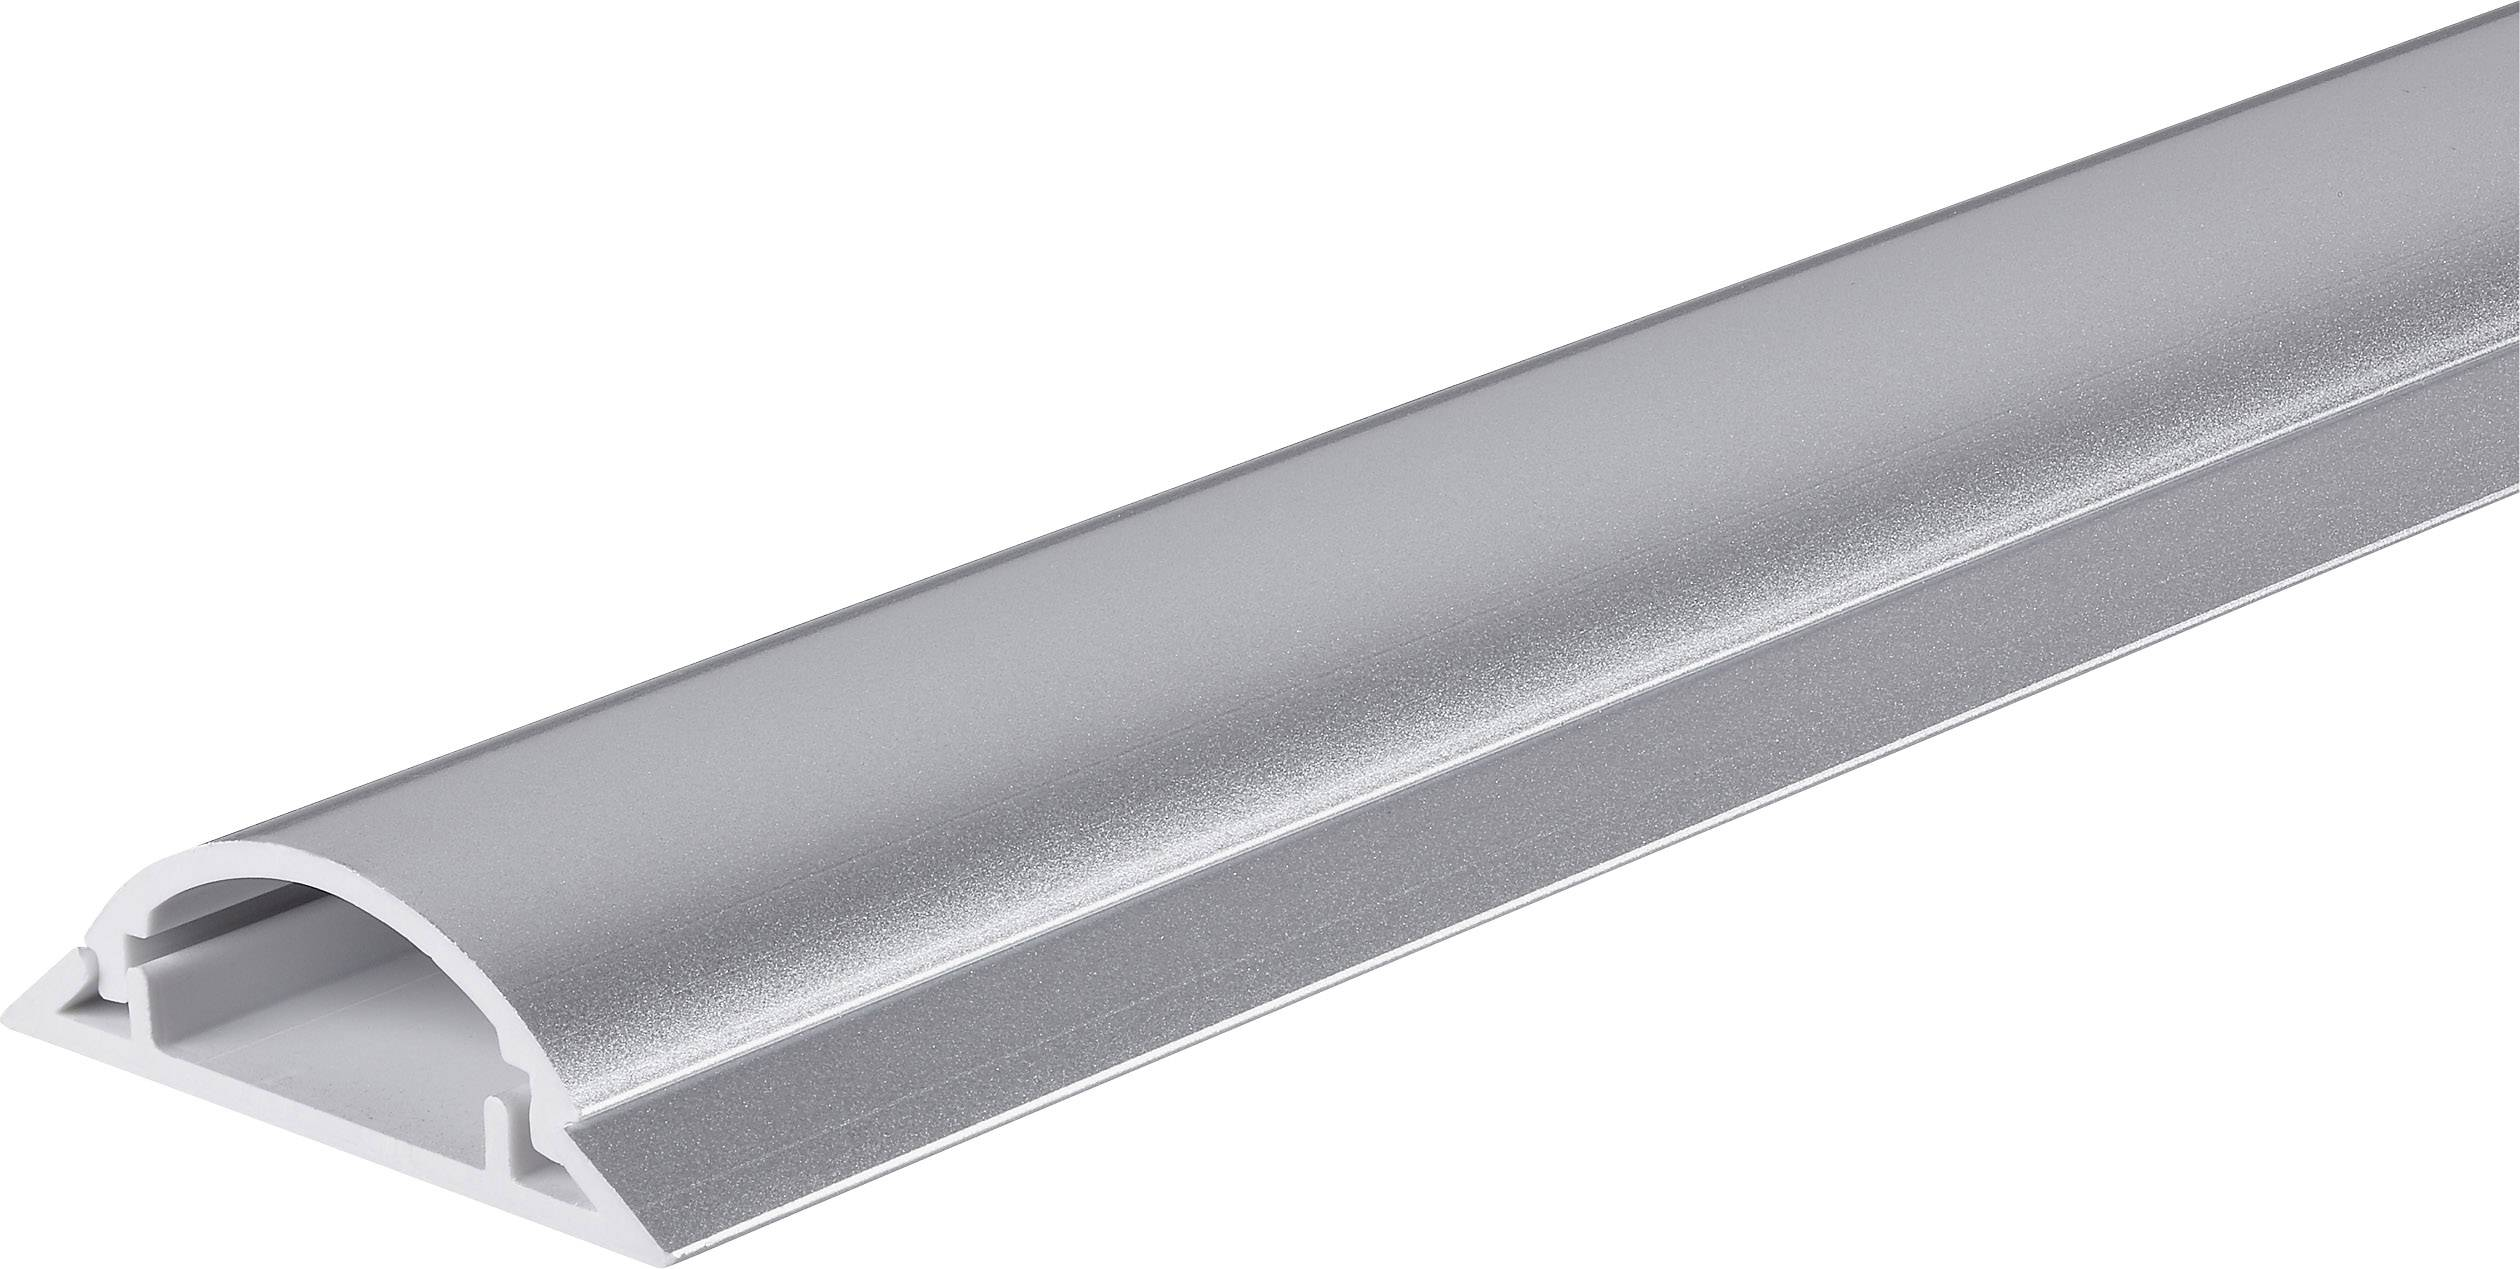 Káblový mostík Conrad Components 1243968 (d x š) 1000 mm x 49.5 mm, strieborná, 1 ks